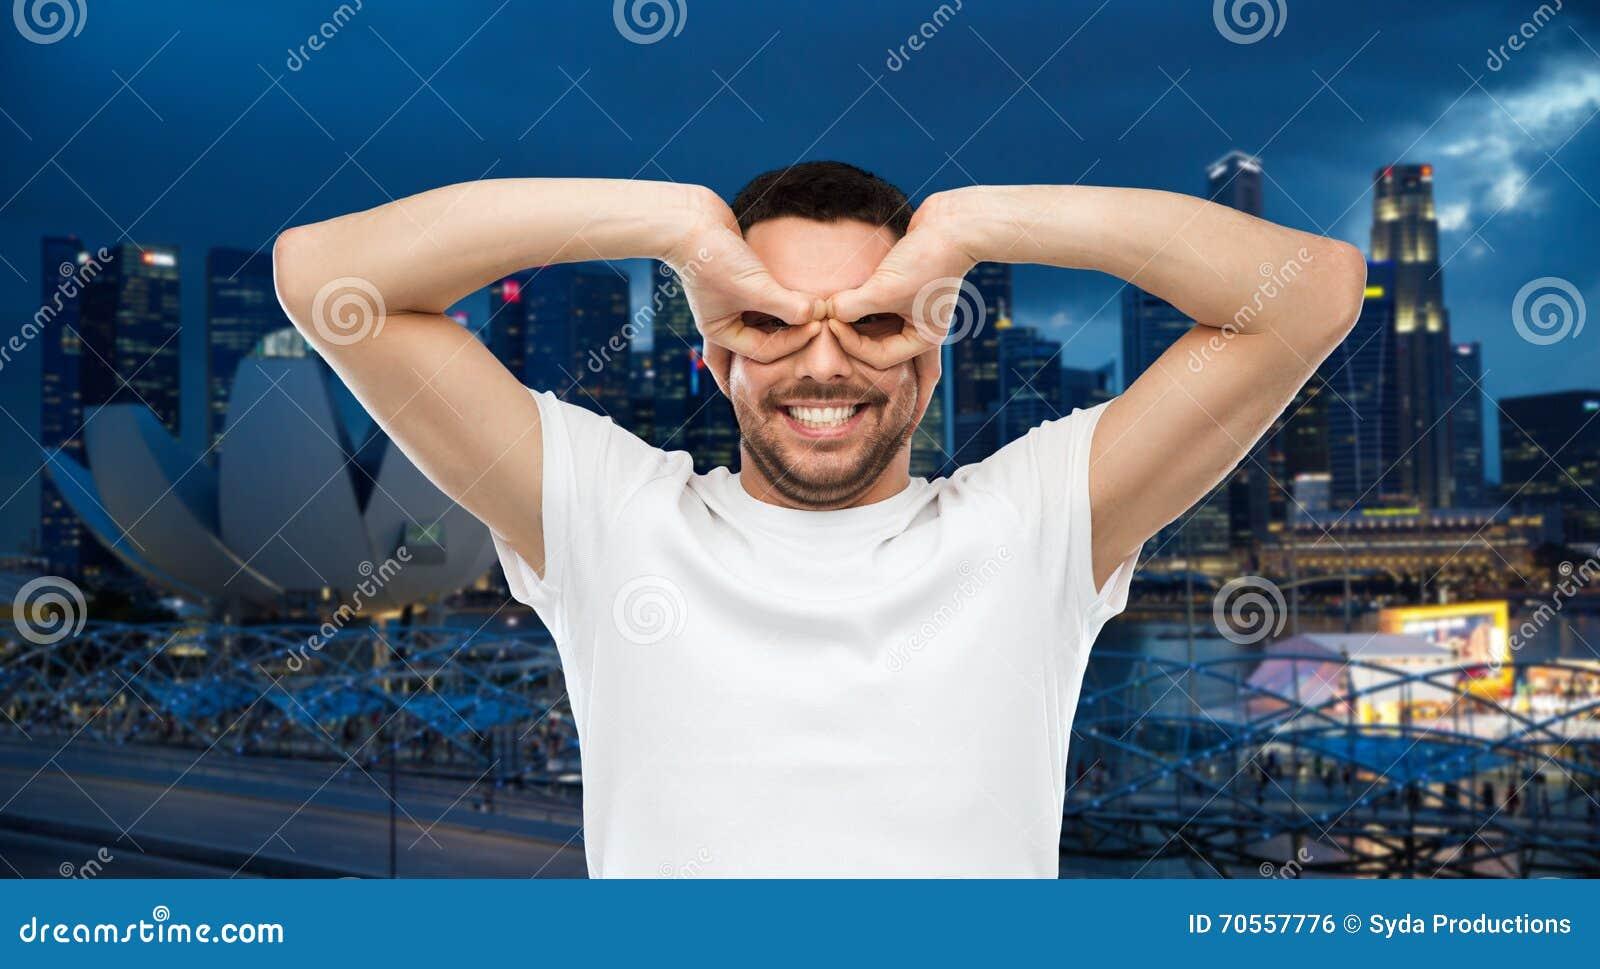 Man making finger glasses over city background